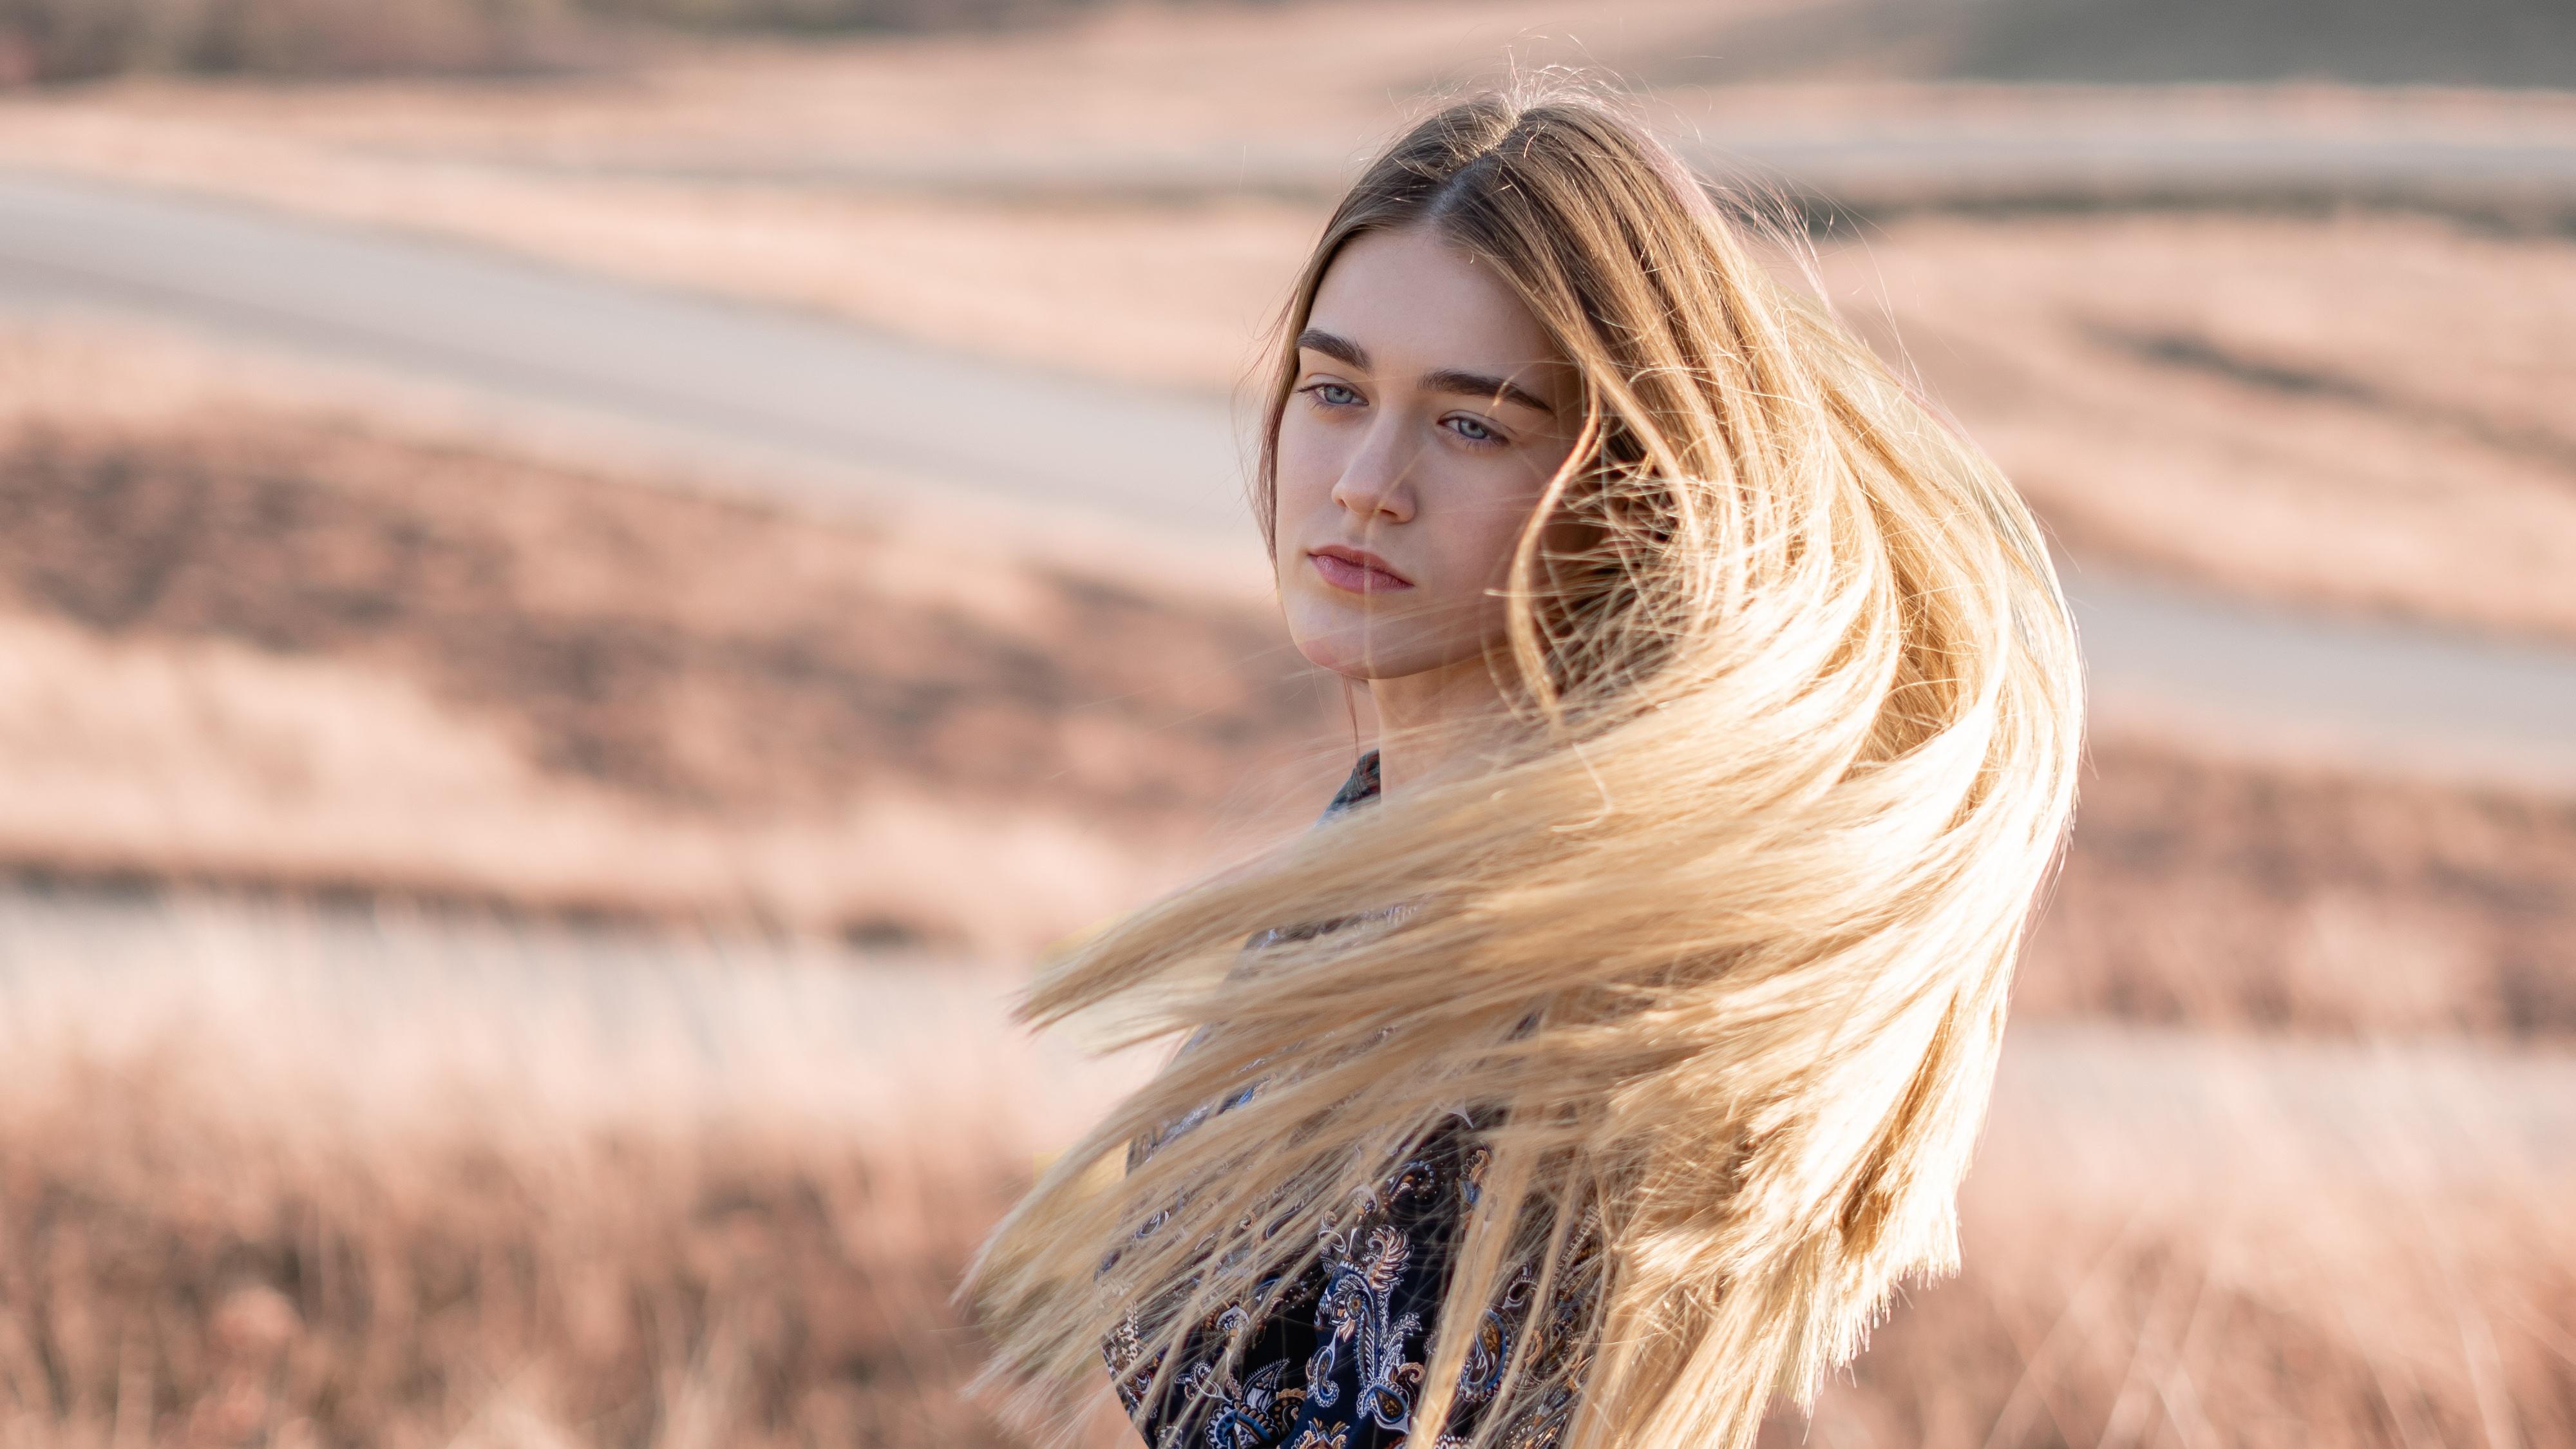 blonde girl hairs in air 1575664519 - Blonde Girl Hairs In Air -